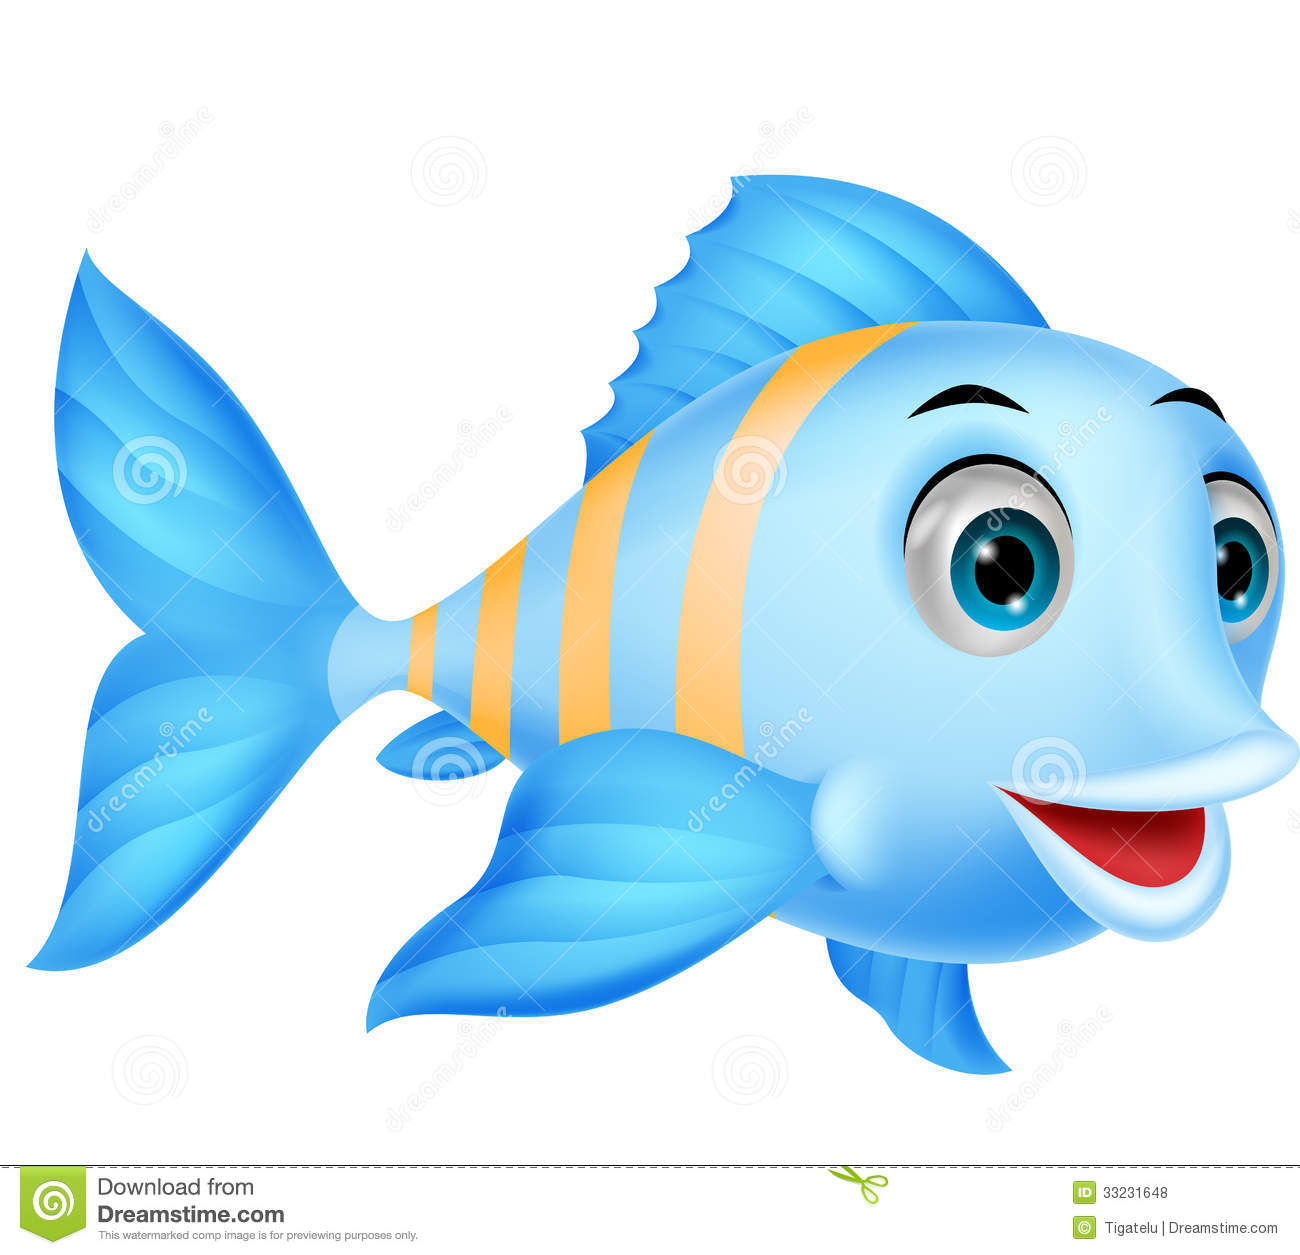 1300x1255 Homey Fish Cartoon Images Free Cute Stock Vector Illustration